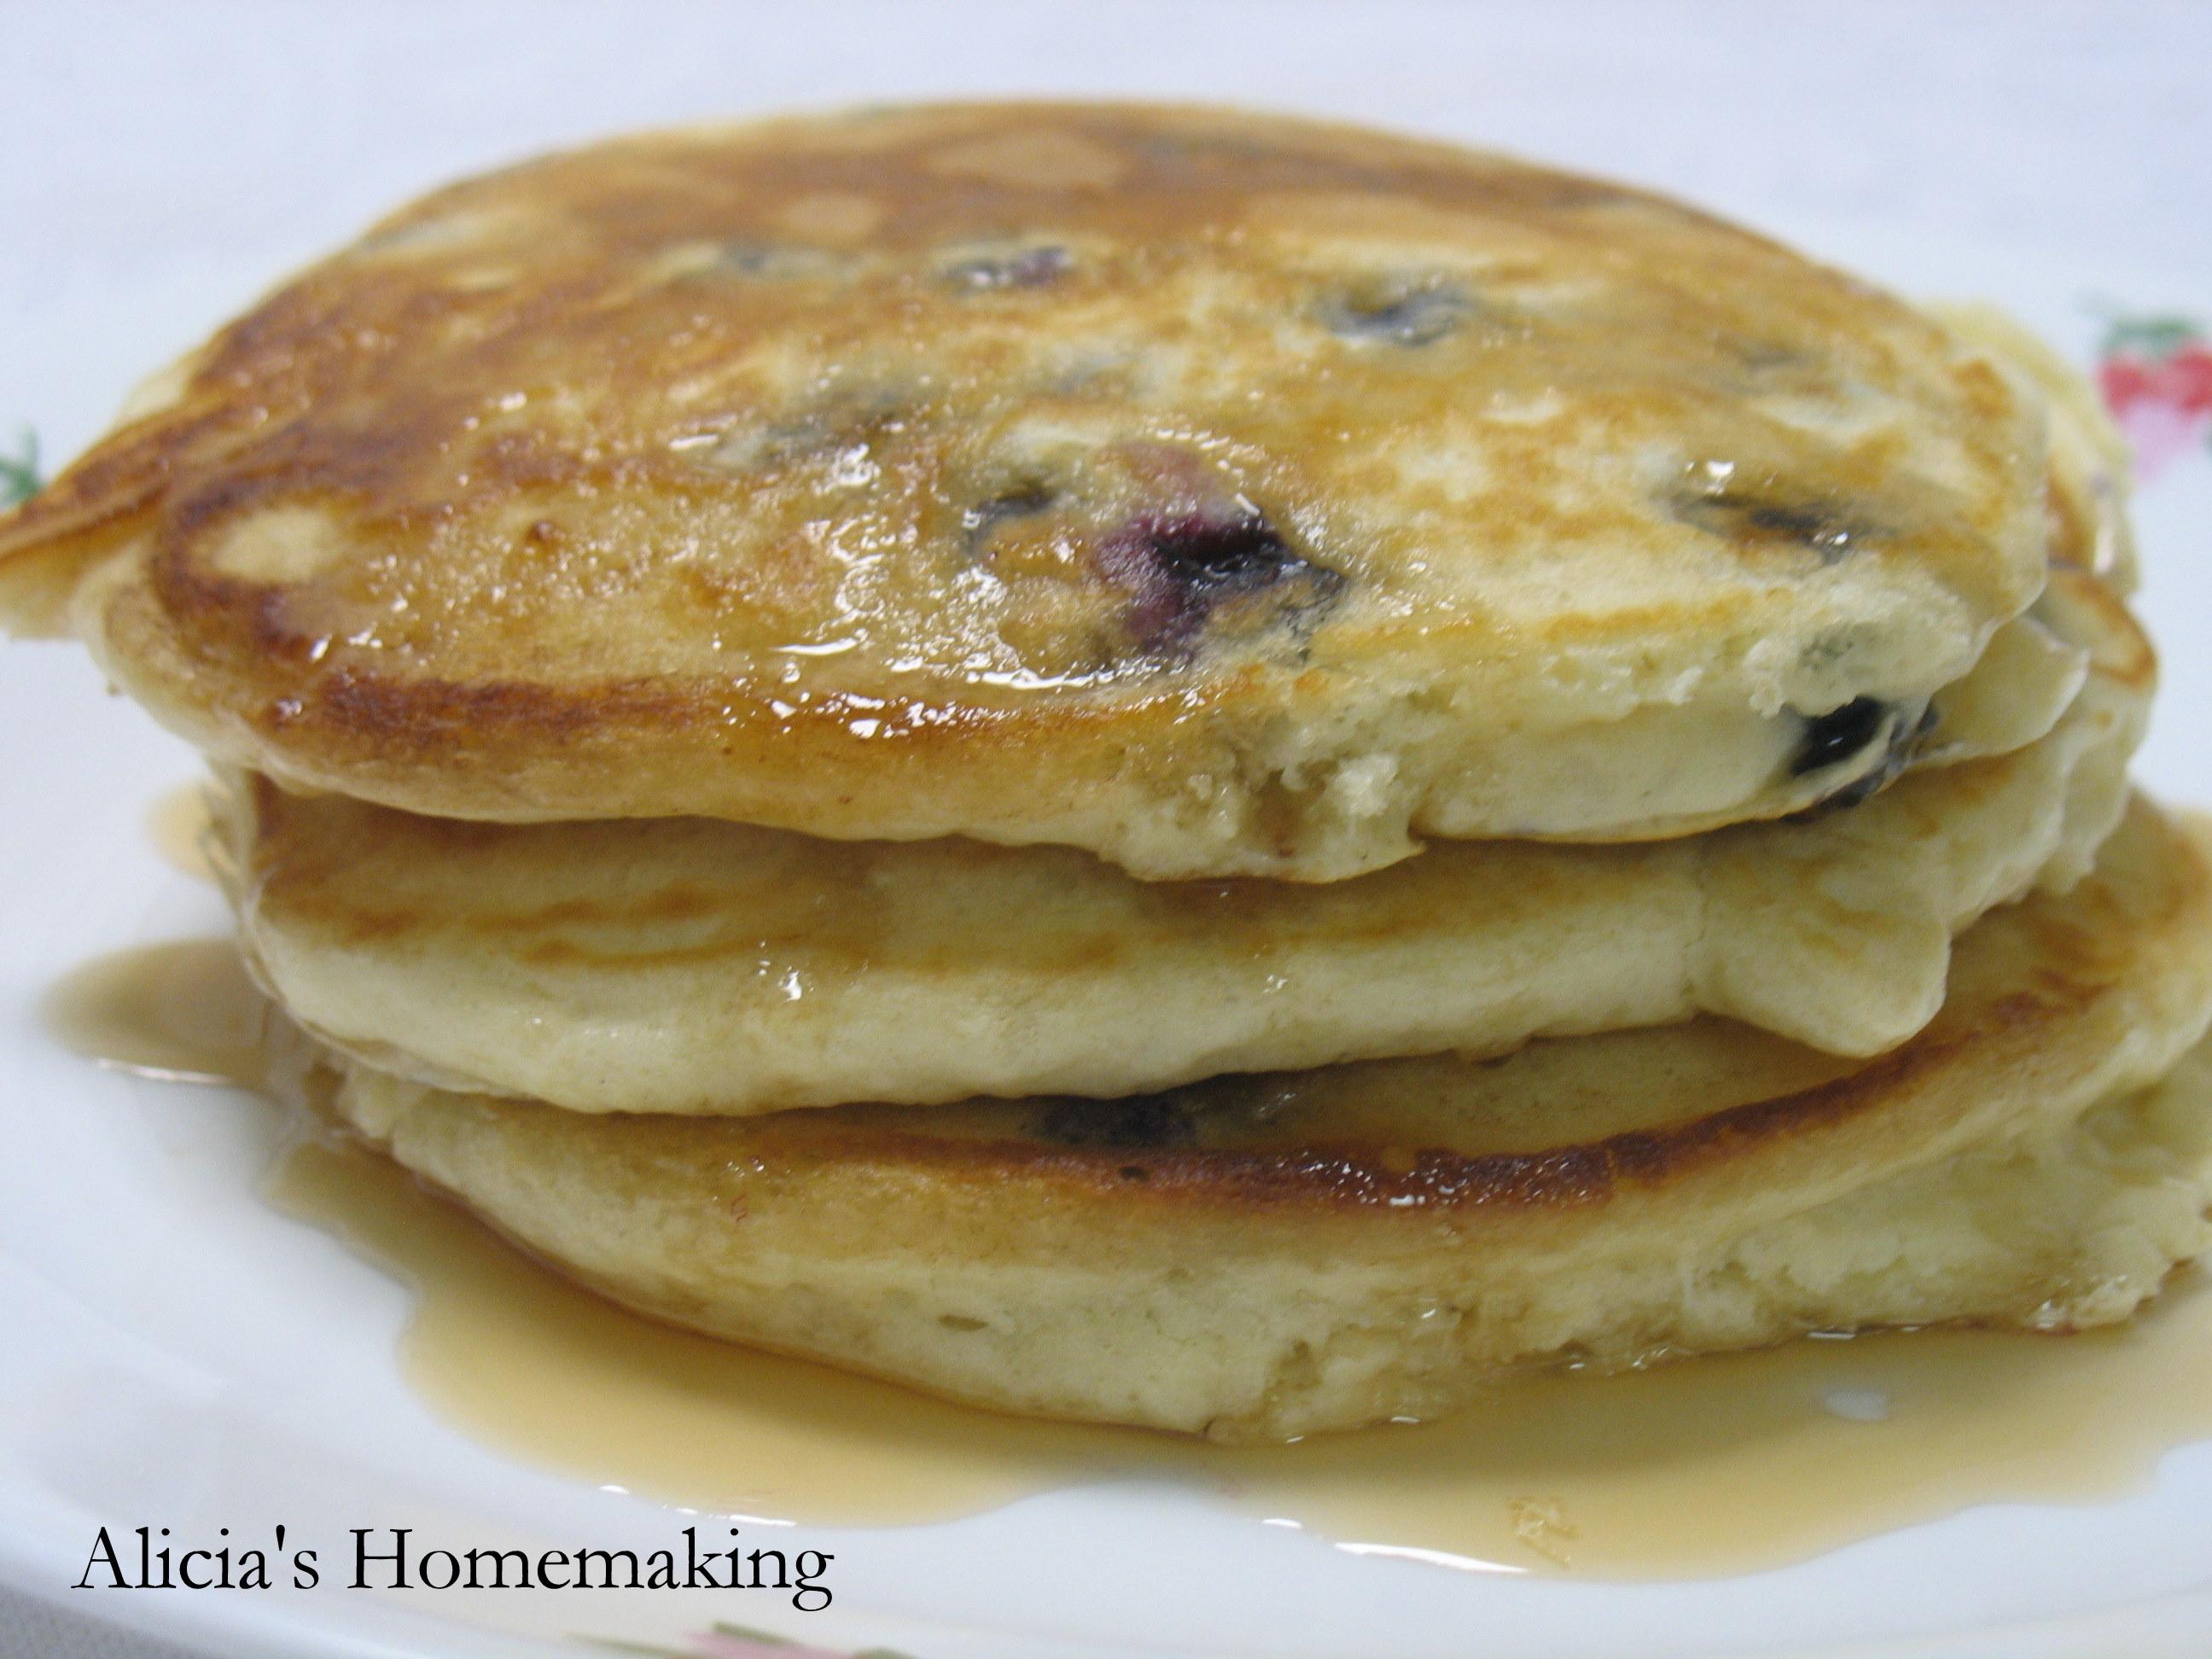 Blueberrry pancakes